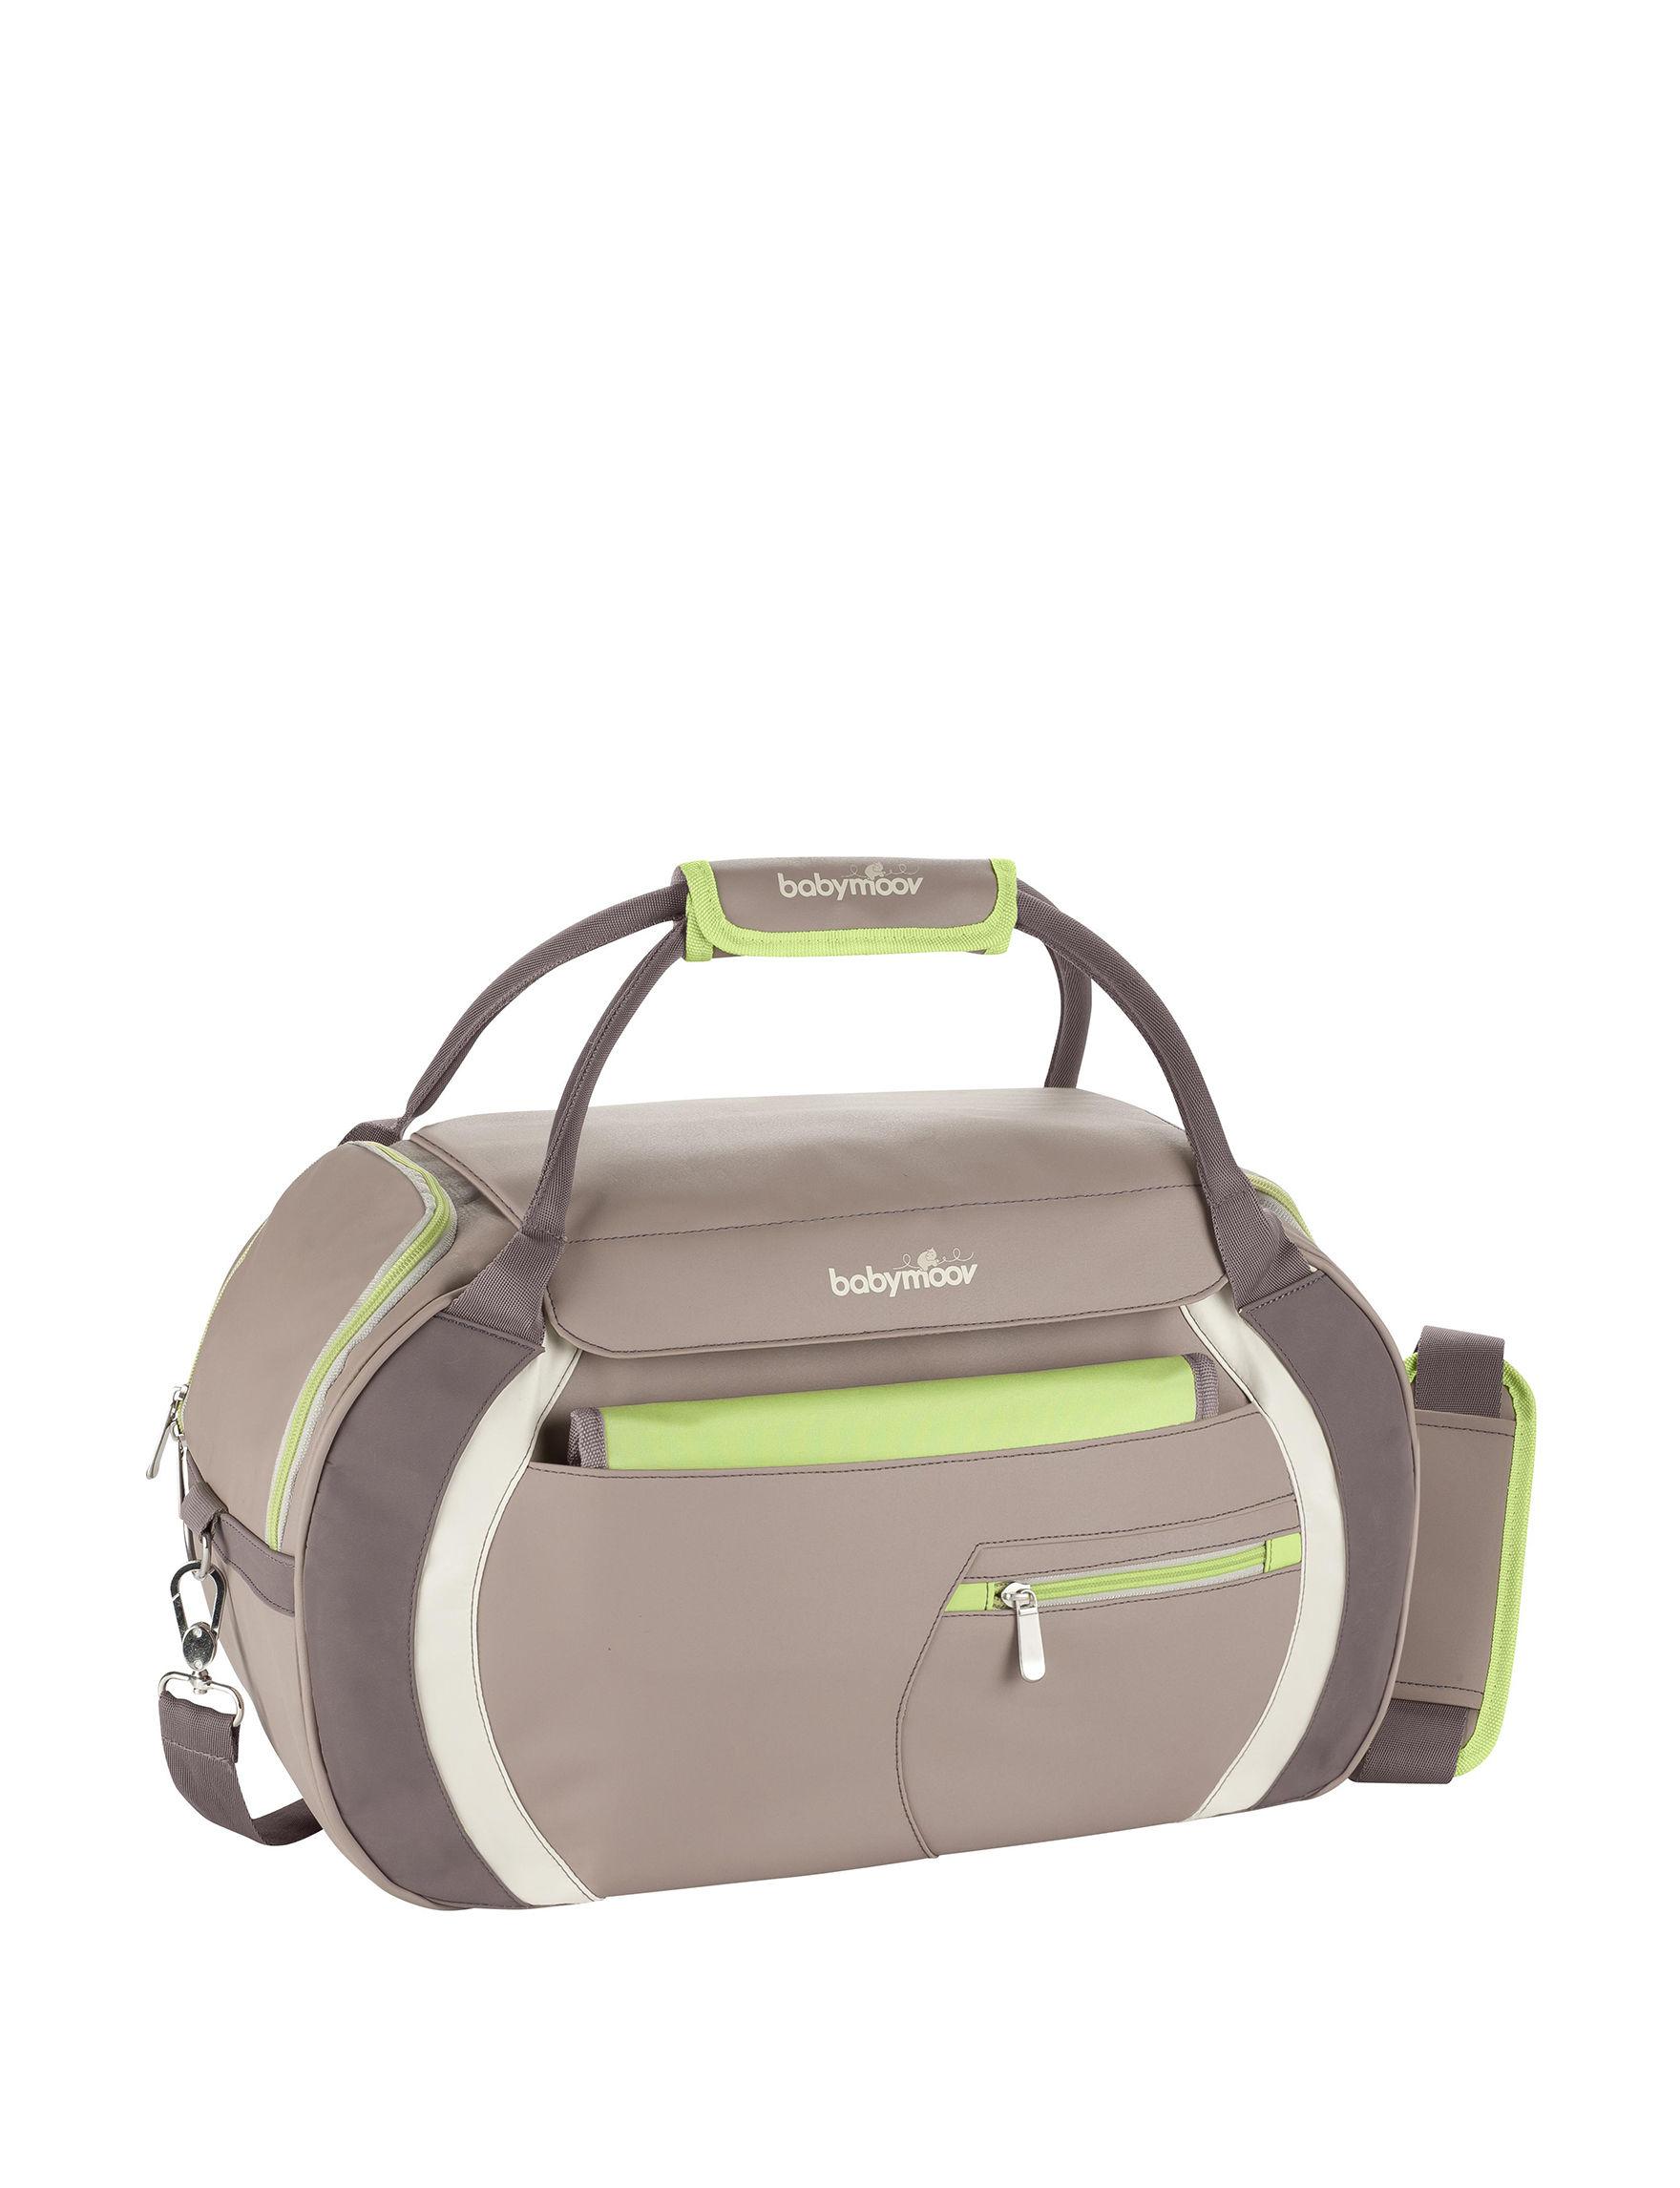 Babymoov Green Diaper Bags